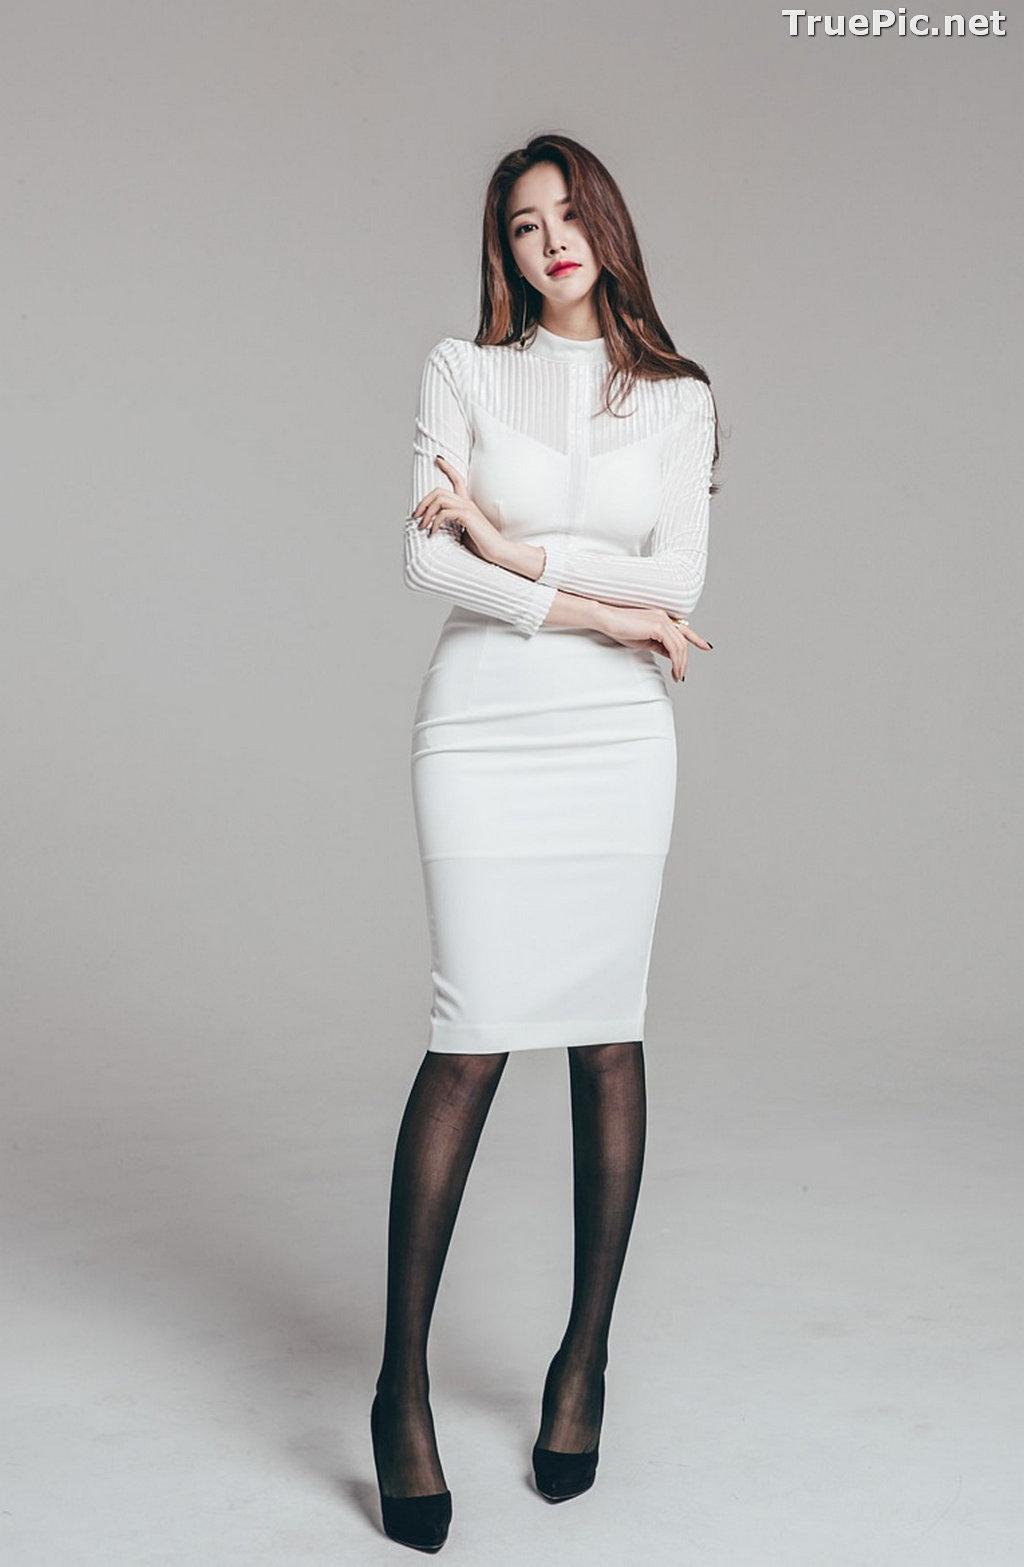 Image Korean Beautiful Model – Park Jung Yoon – Fashion Photography #11 - TruePic.net - Picture-52